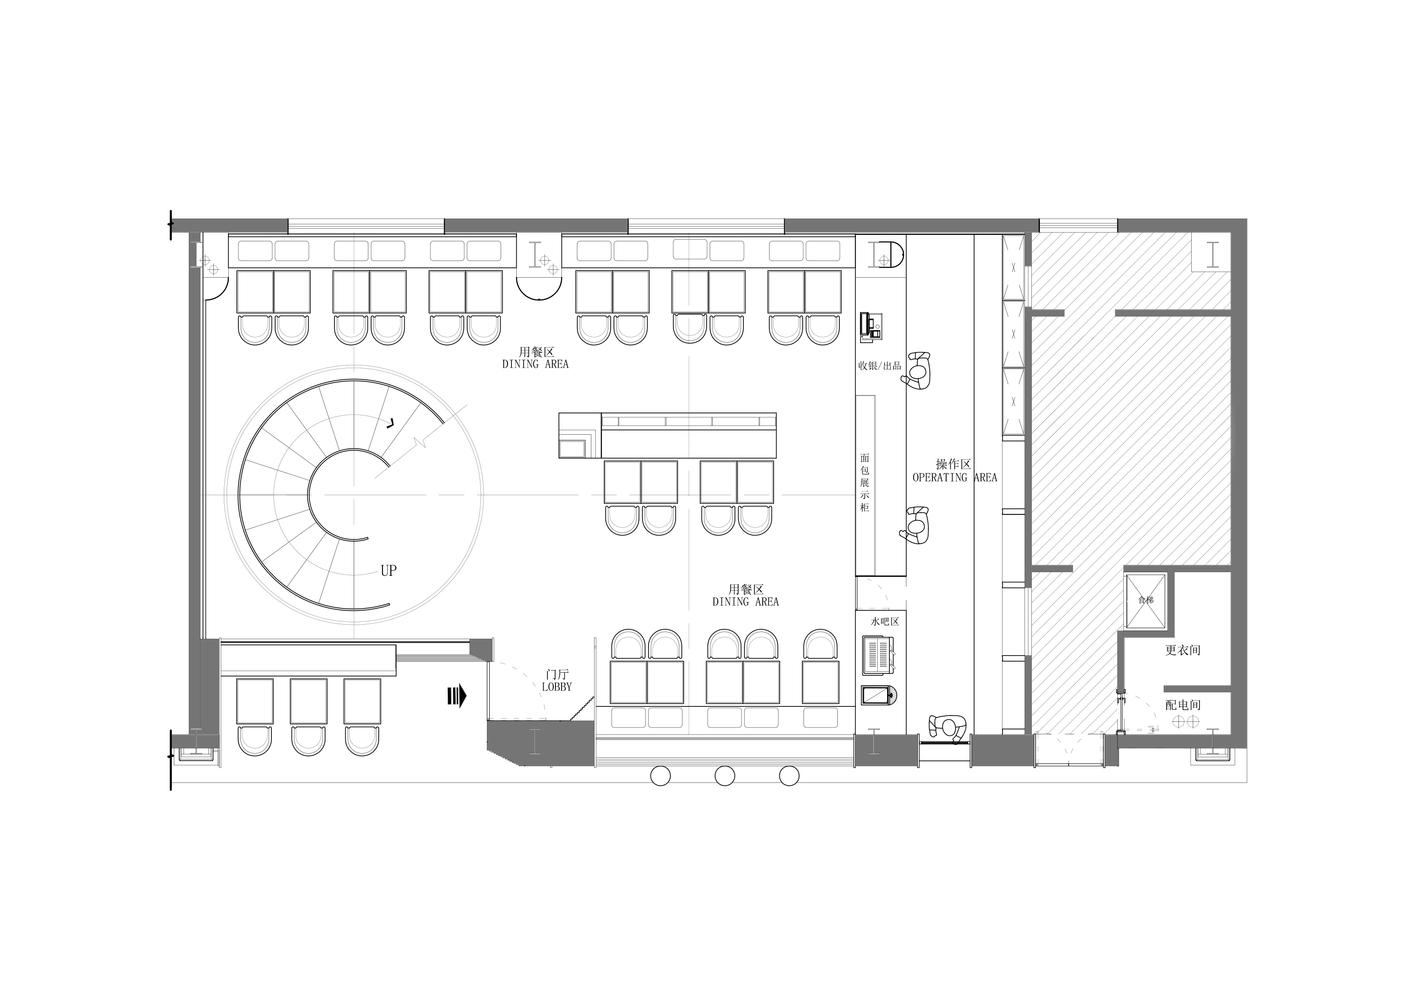 design restaurant plan - Zeppe